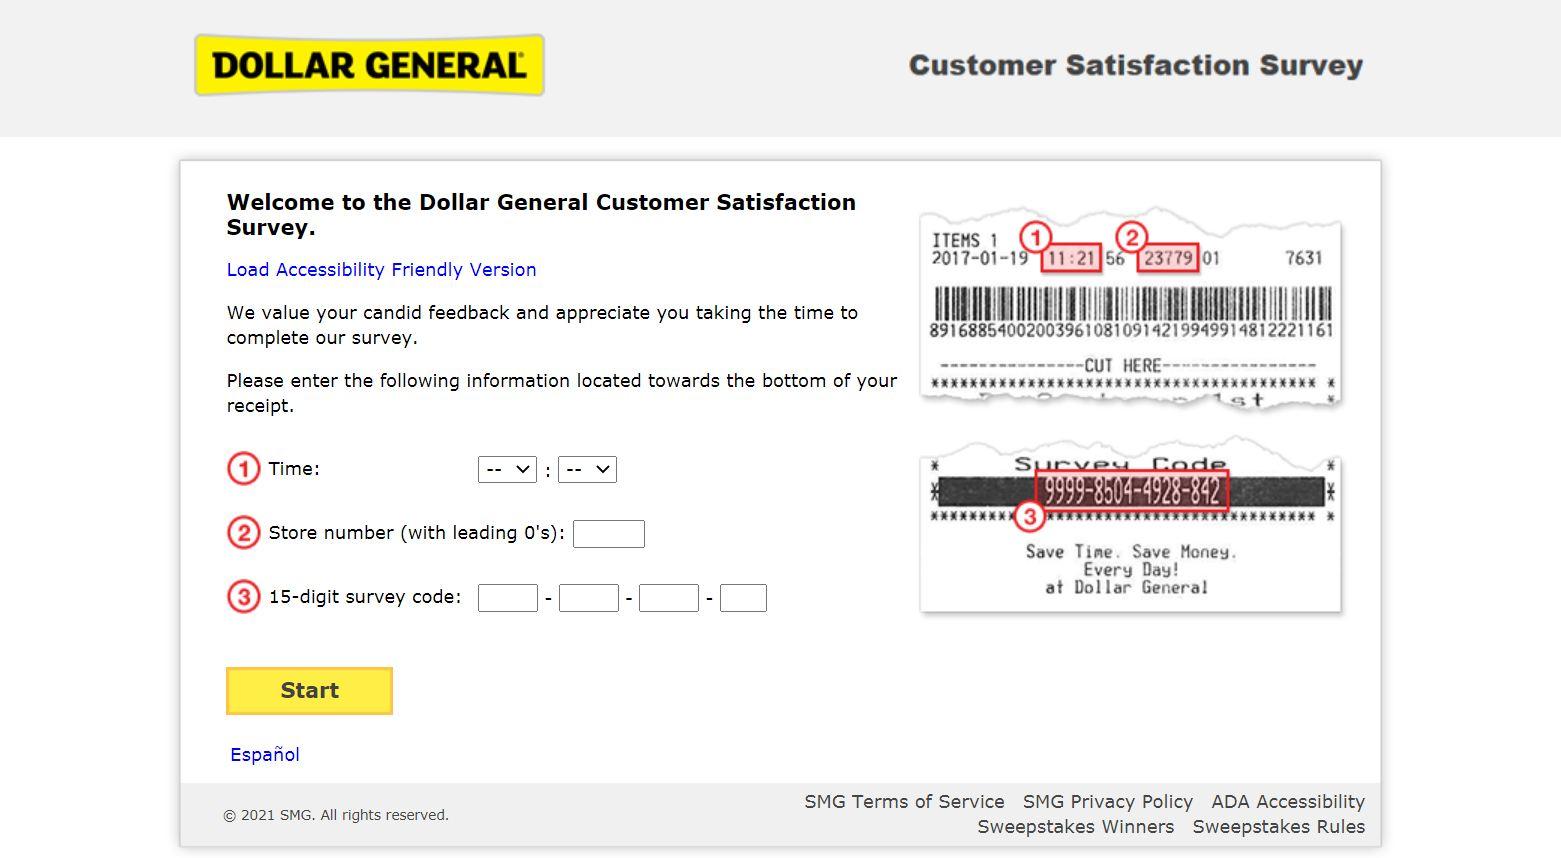 Dgcustomerfirst.com - Dollar General Survey to Win $100 Gift Card